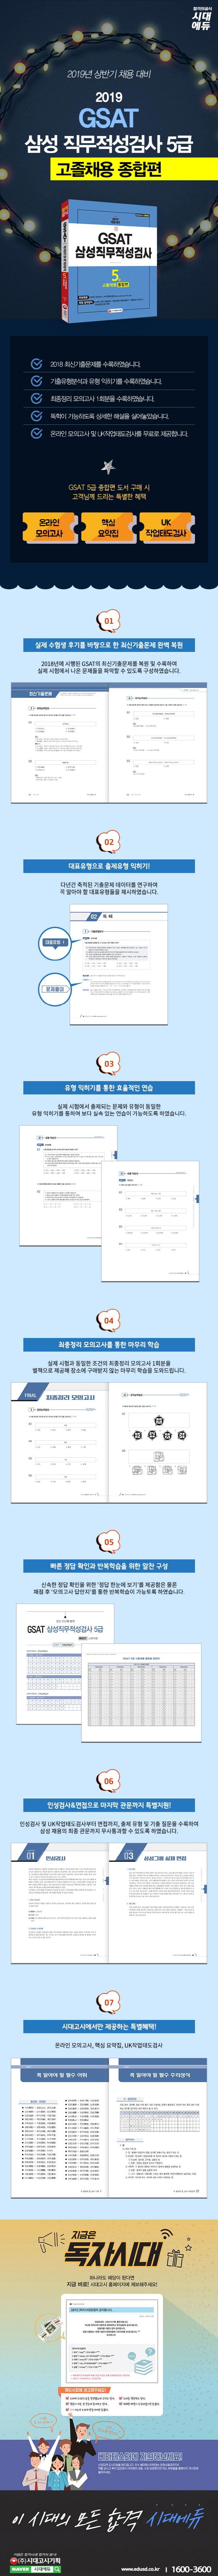 GSAT 삼성 직무적성검사 5급 고졸 채용 종합편(2019) 도서 상세이미지